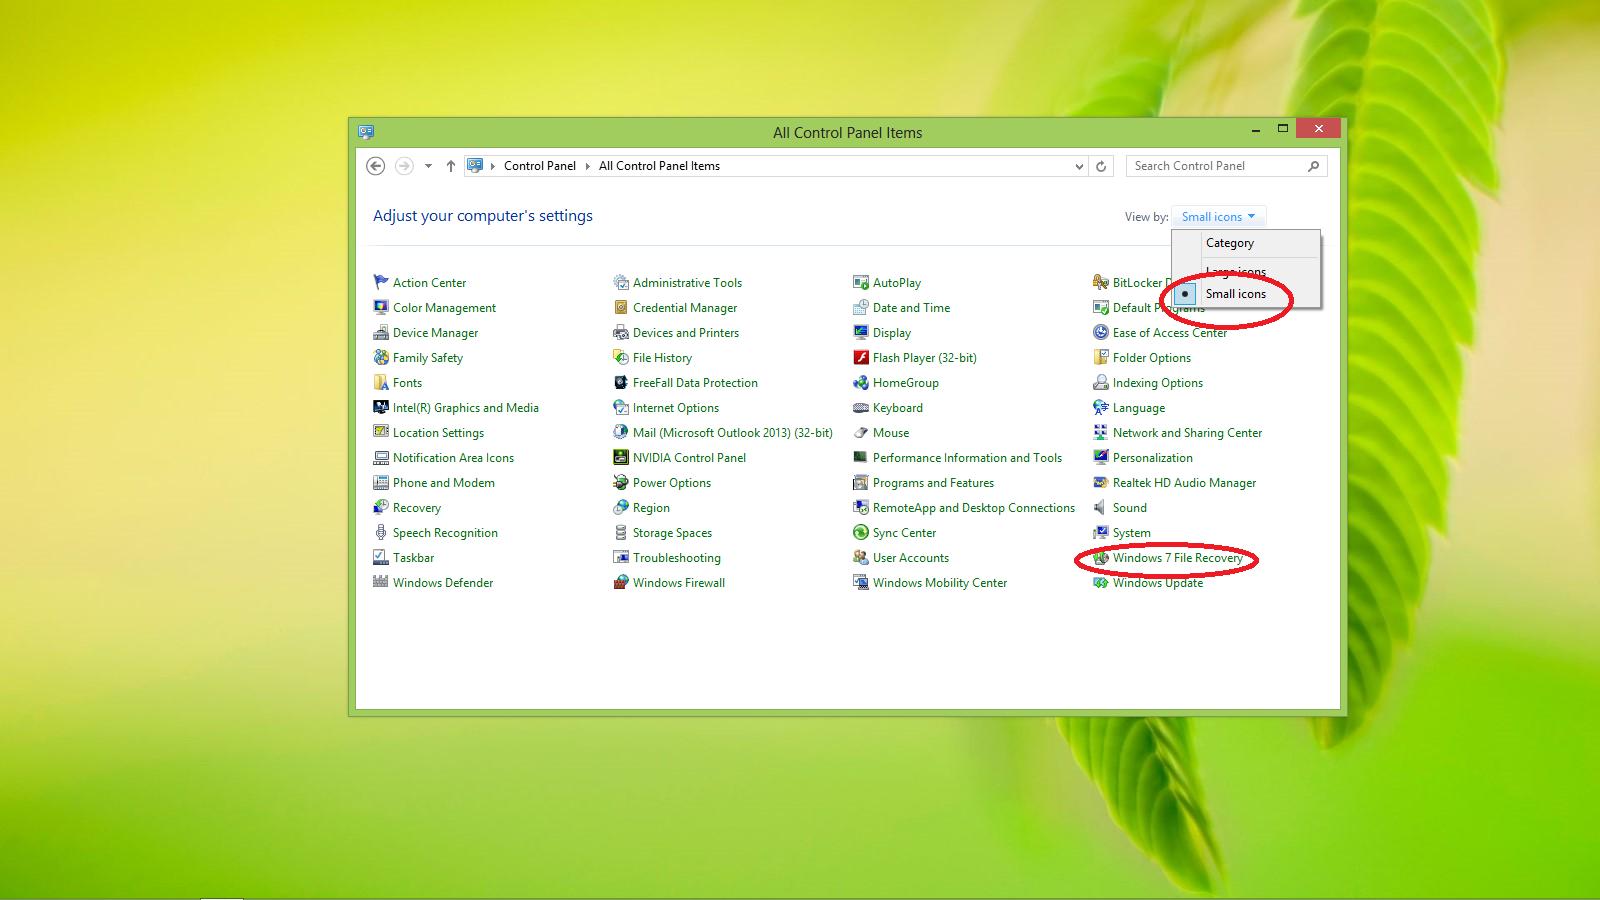 Renante Era's Blog: Optimizing Windows 8 Pro to maximize its